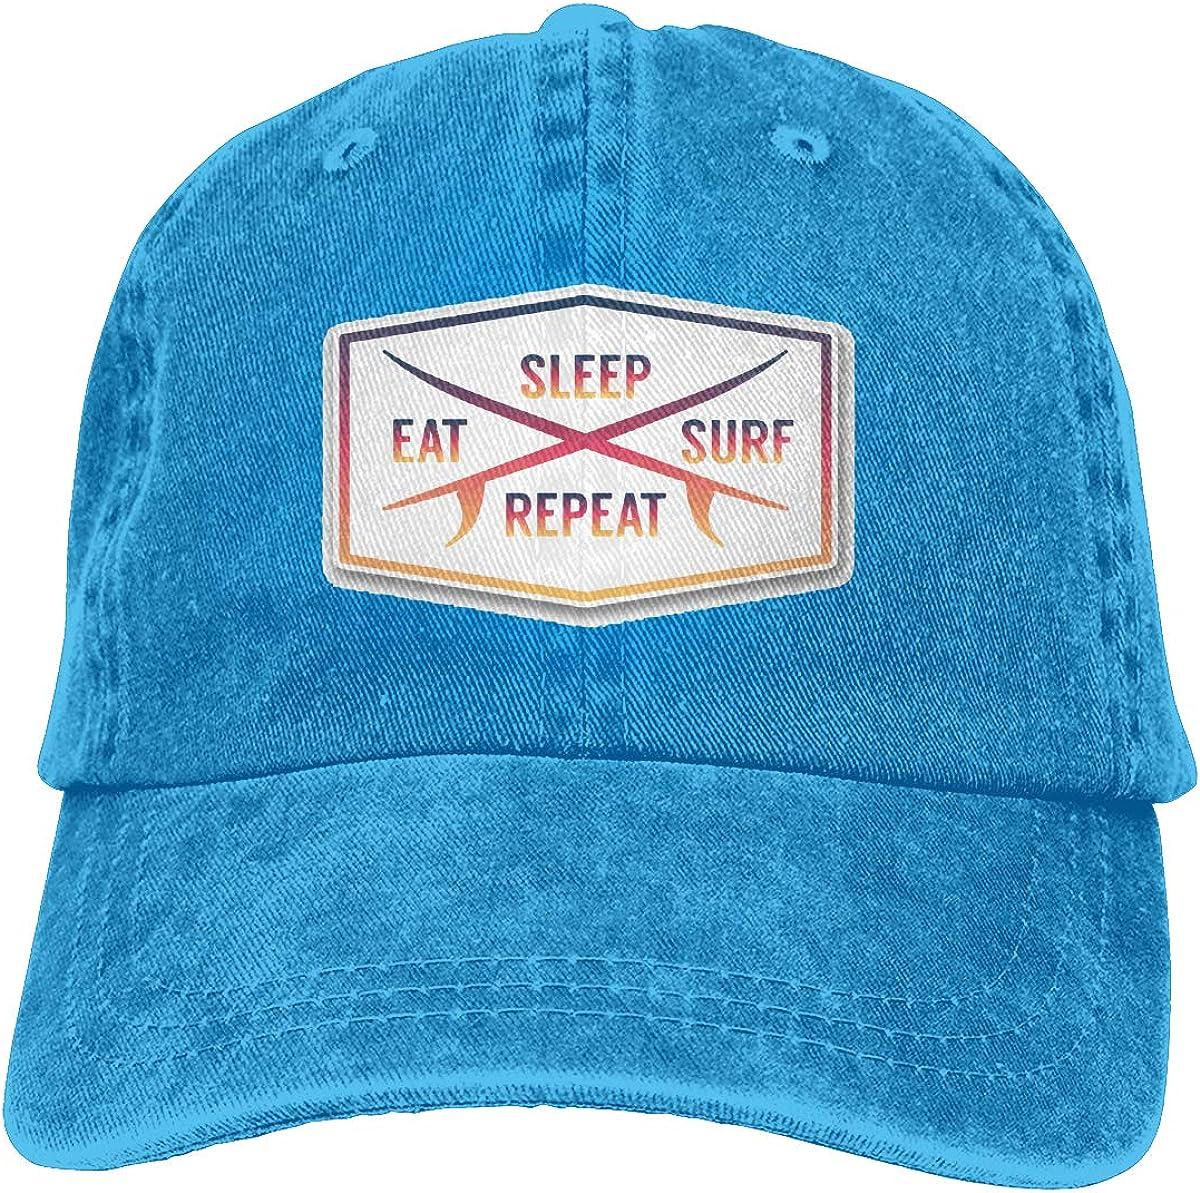 Q89 Eat Sleep Surf Repeat Unisex Personalize Cowboy Outdoor Sports Hat Adjustable Baseball Cap